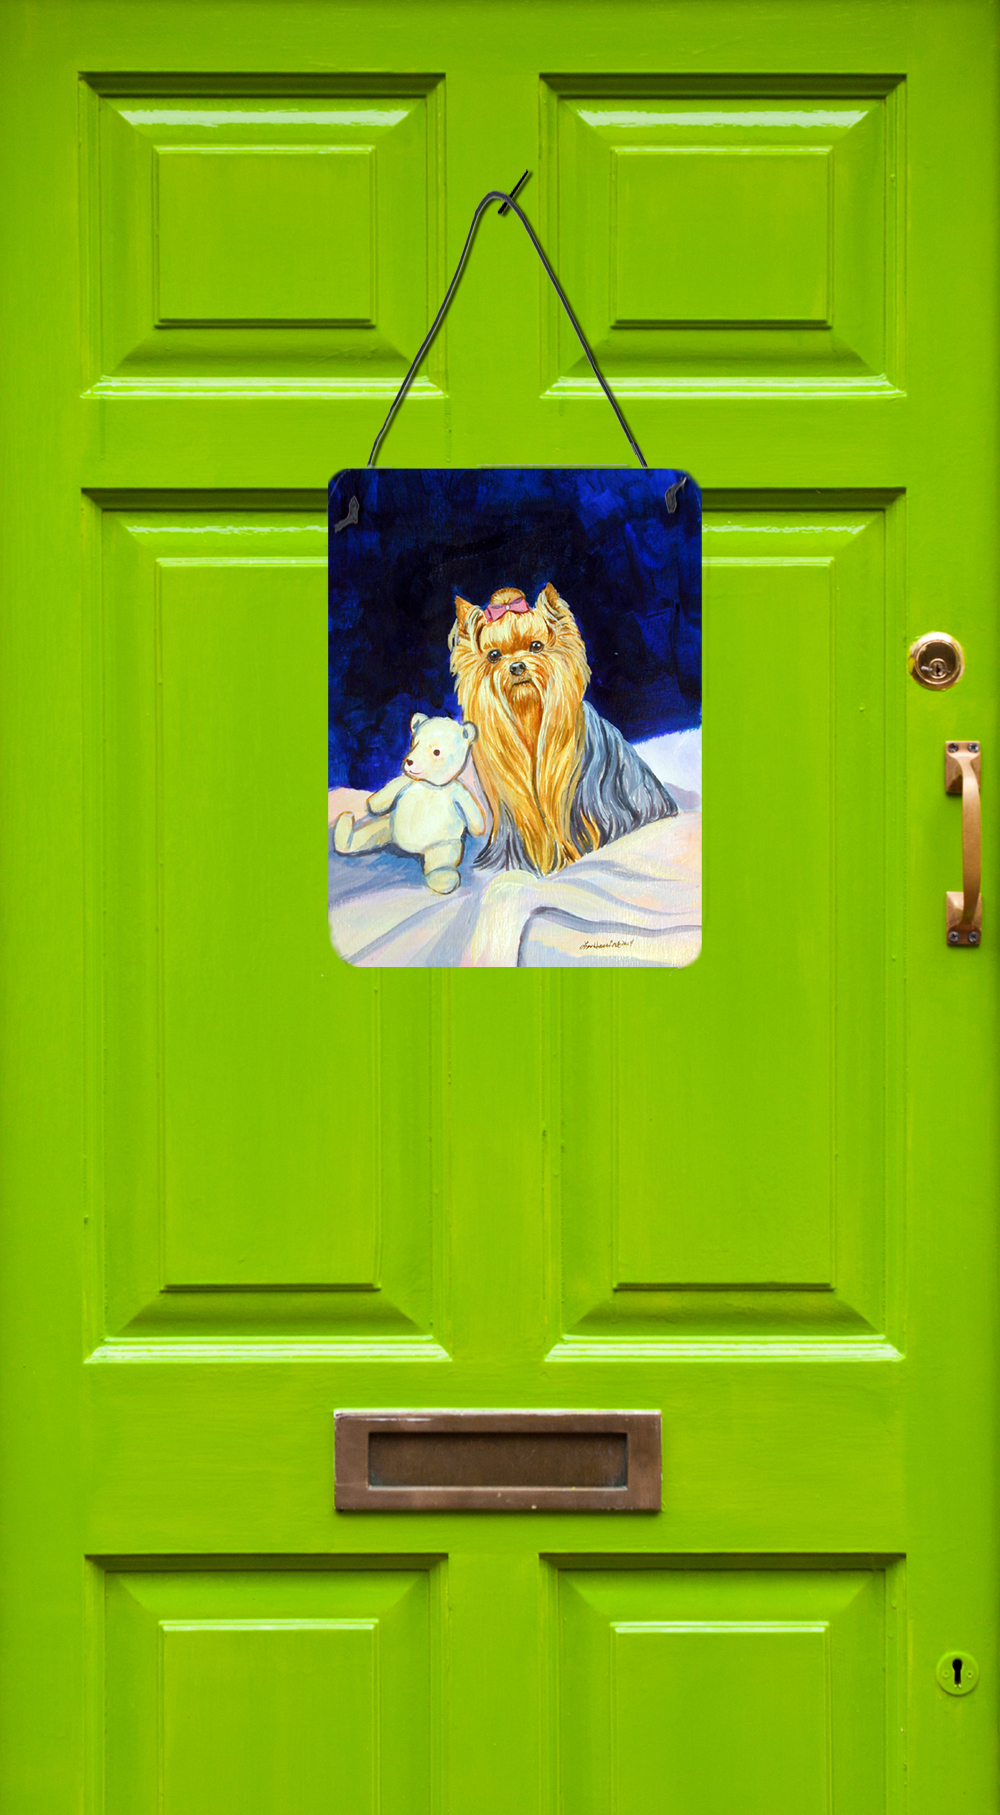 12x16 Carolines Treasures 7221DS1216 Yorkie and Teddy Bear Aluminium Metal Wall or Door Hanging Prints Multicolor